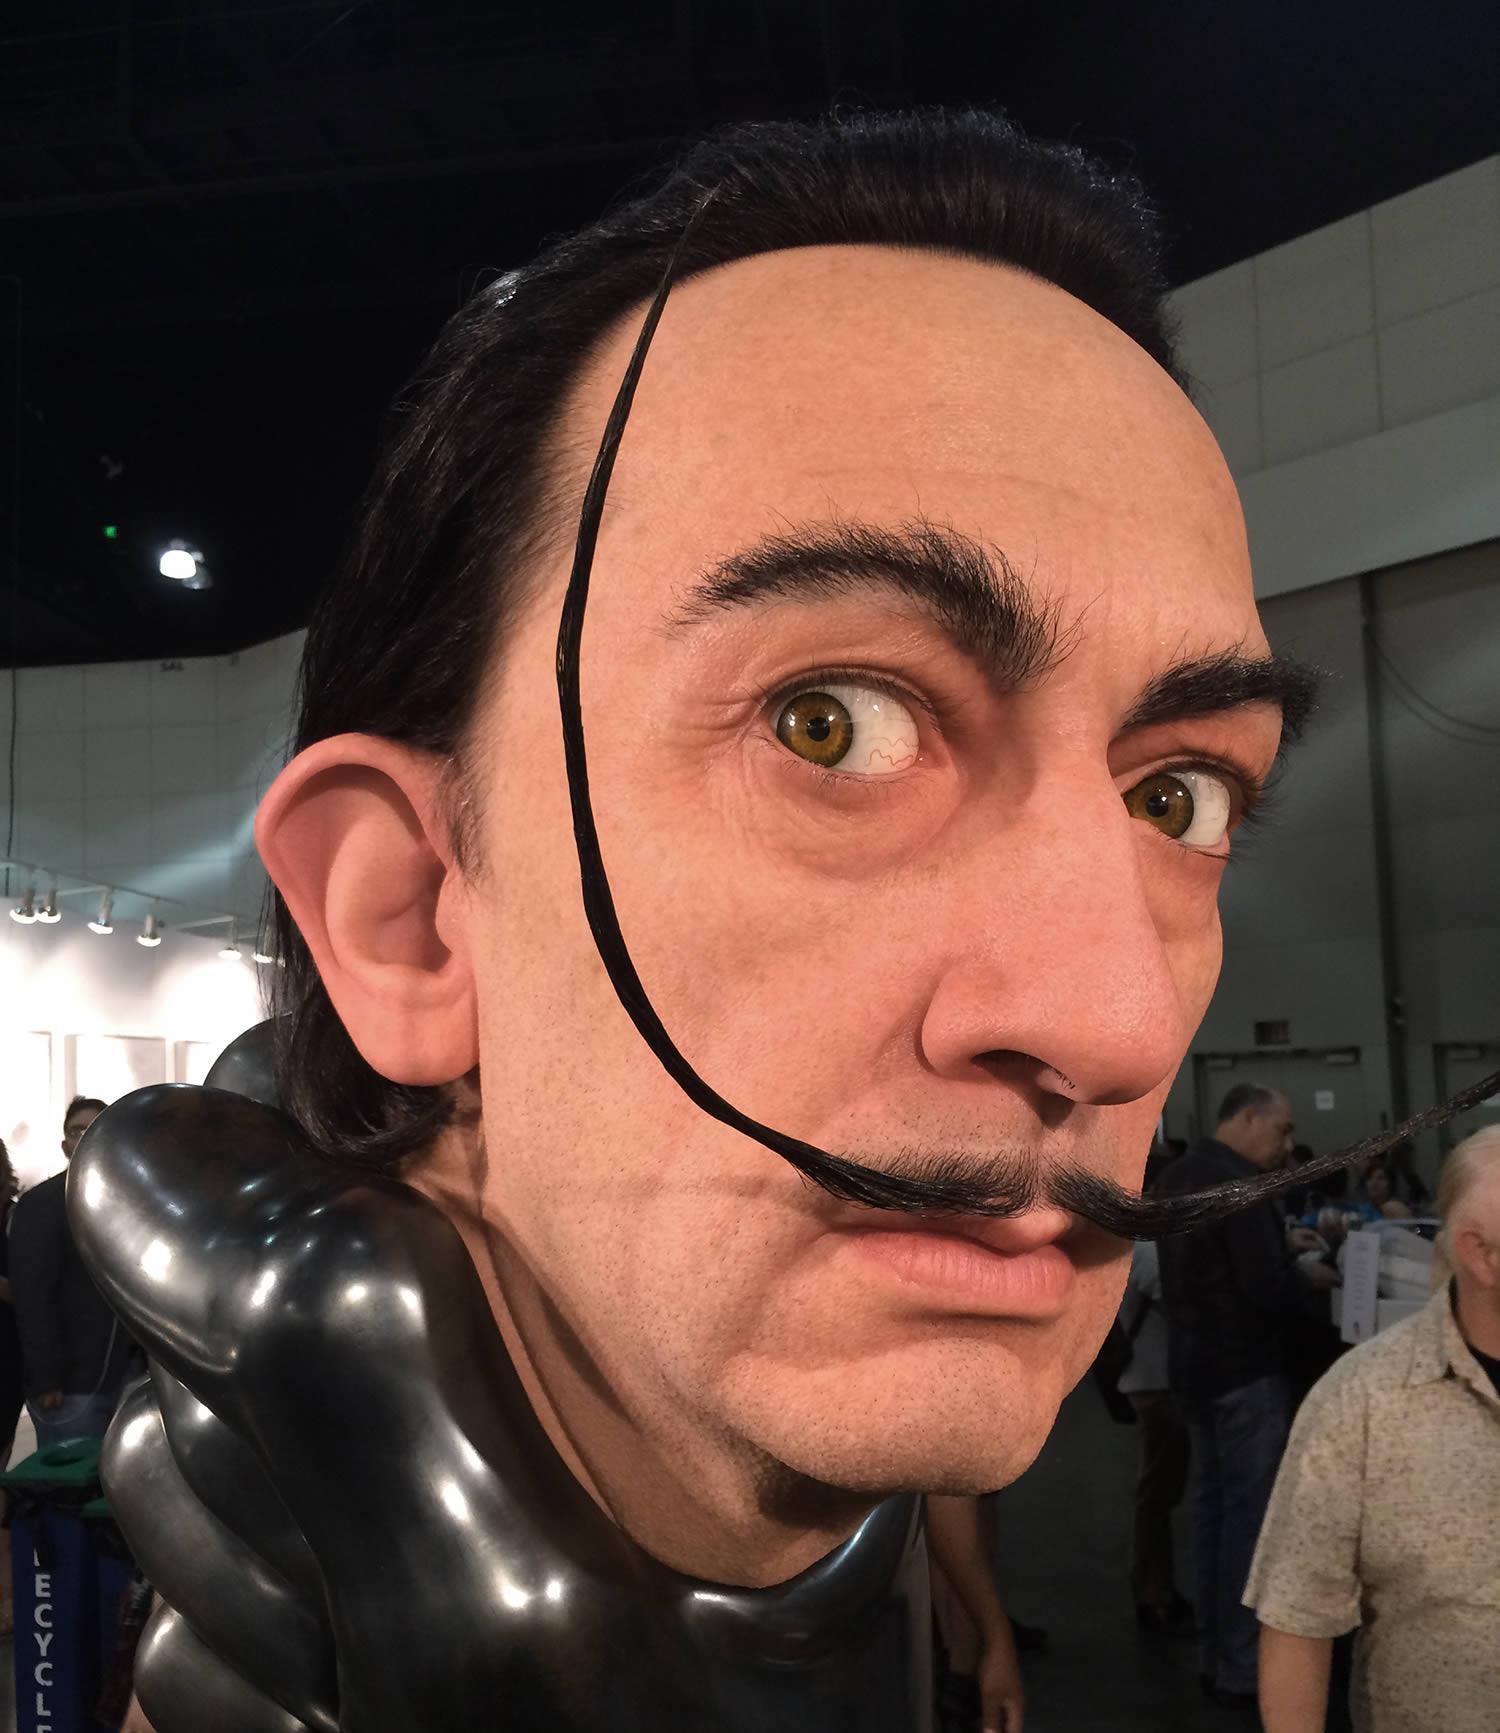 salvador dali, hyperrealist sculpture by Kazuhiro Tsuji